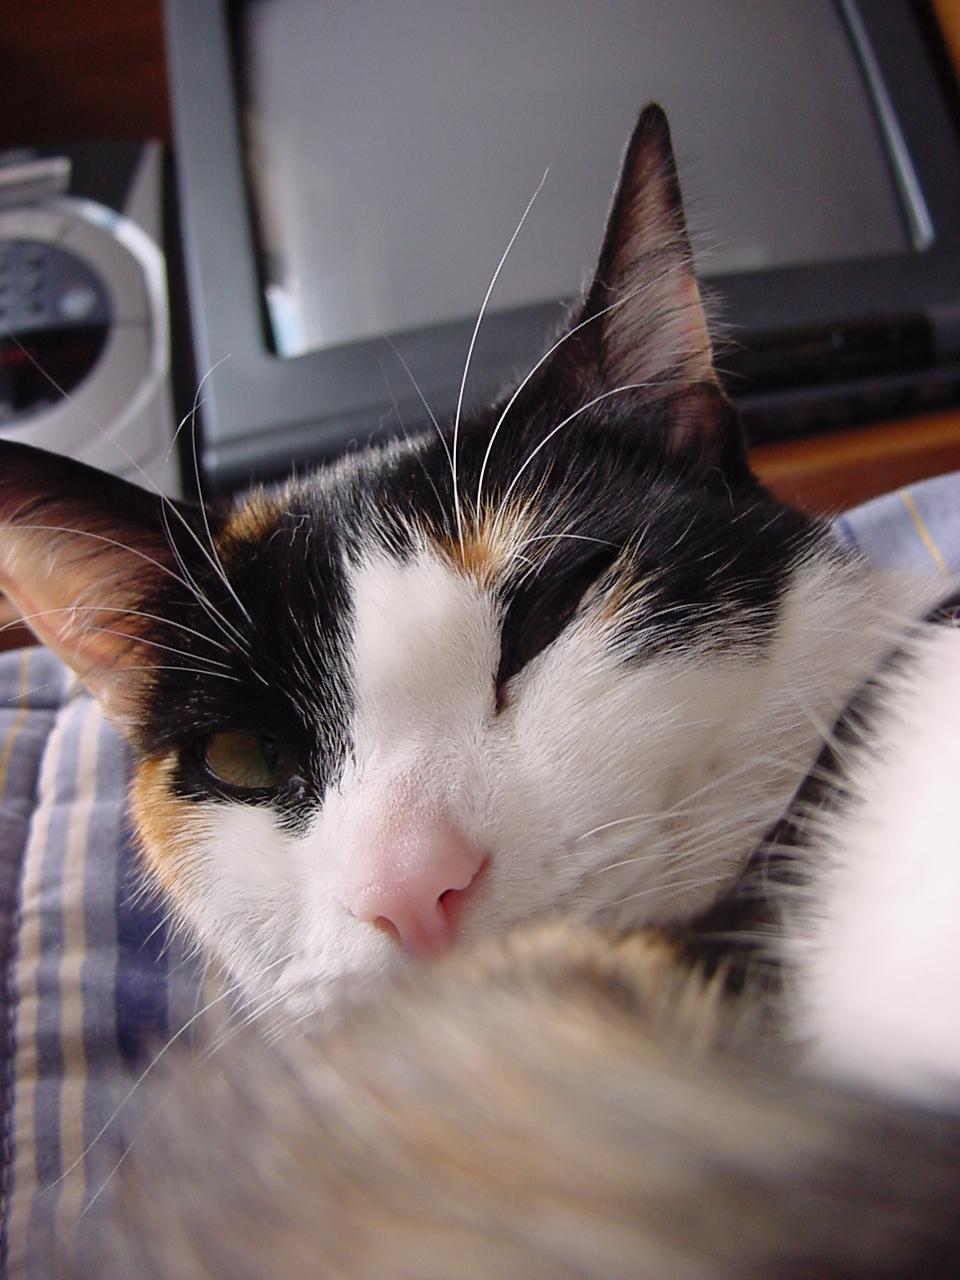 insektokutor sleeping cat pet fur soft